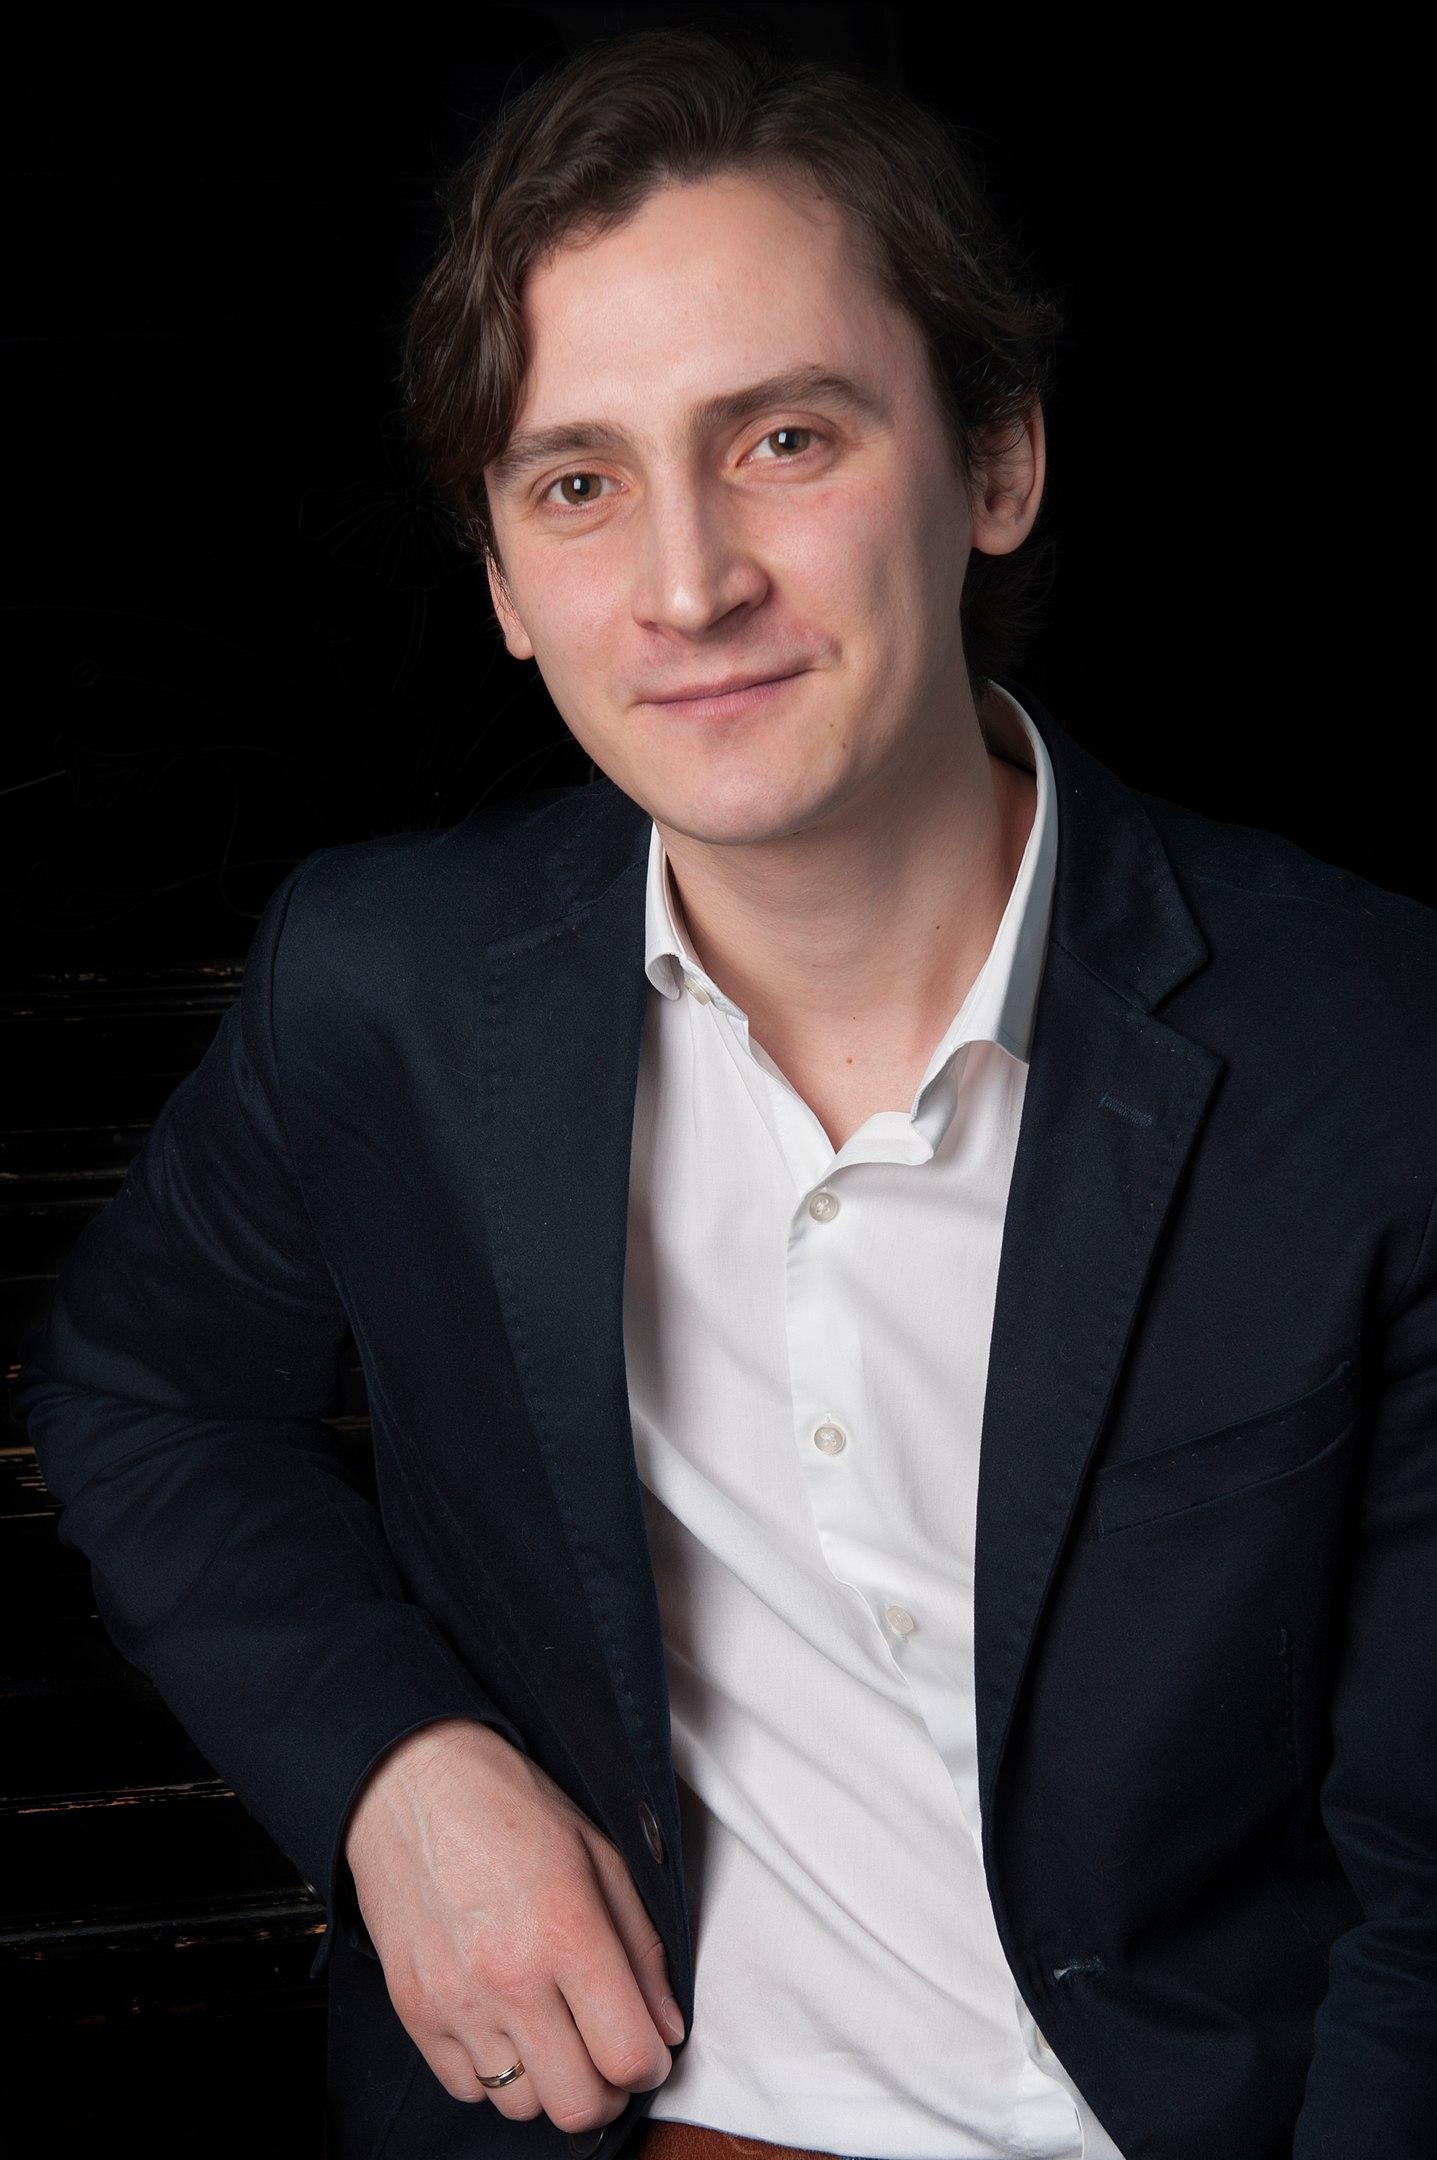 Психолог Андрей Пономарёв